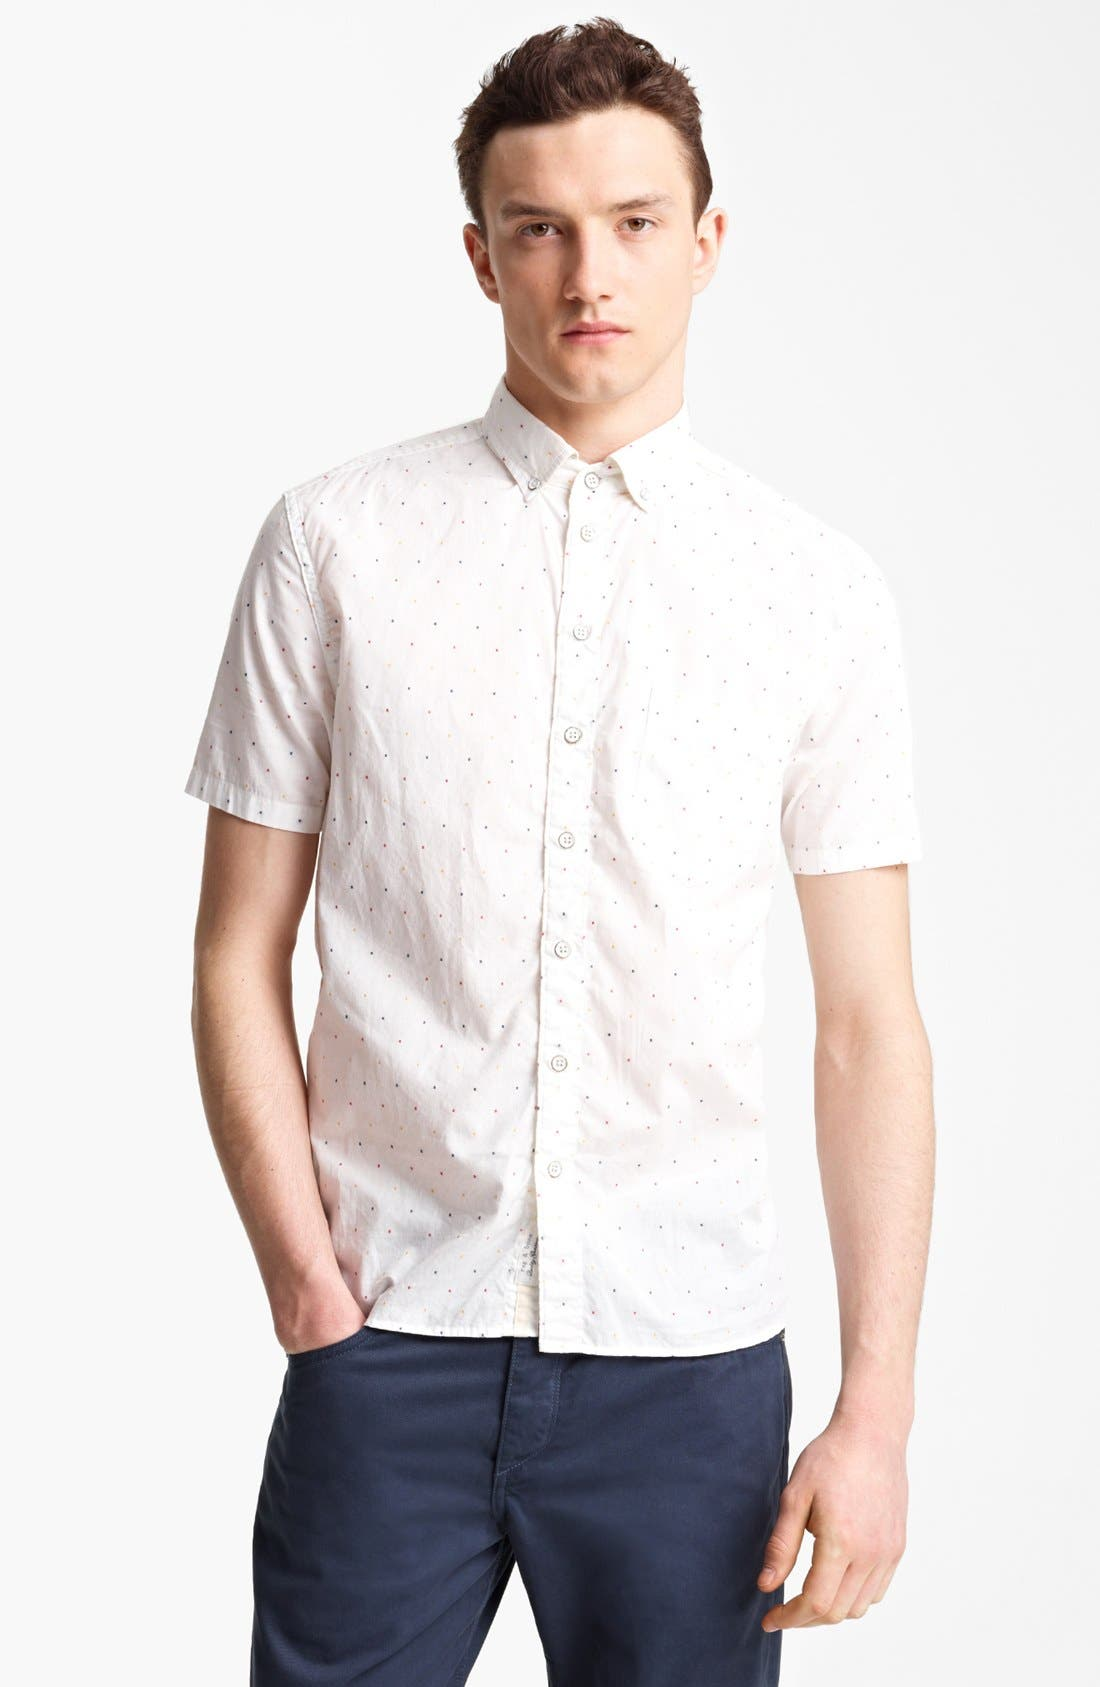 RAG & BONE, Dot Woven Shirt, Main thumbnail 1, color, 100